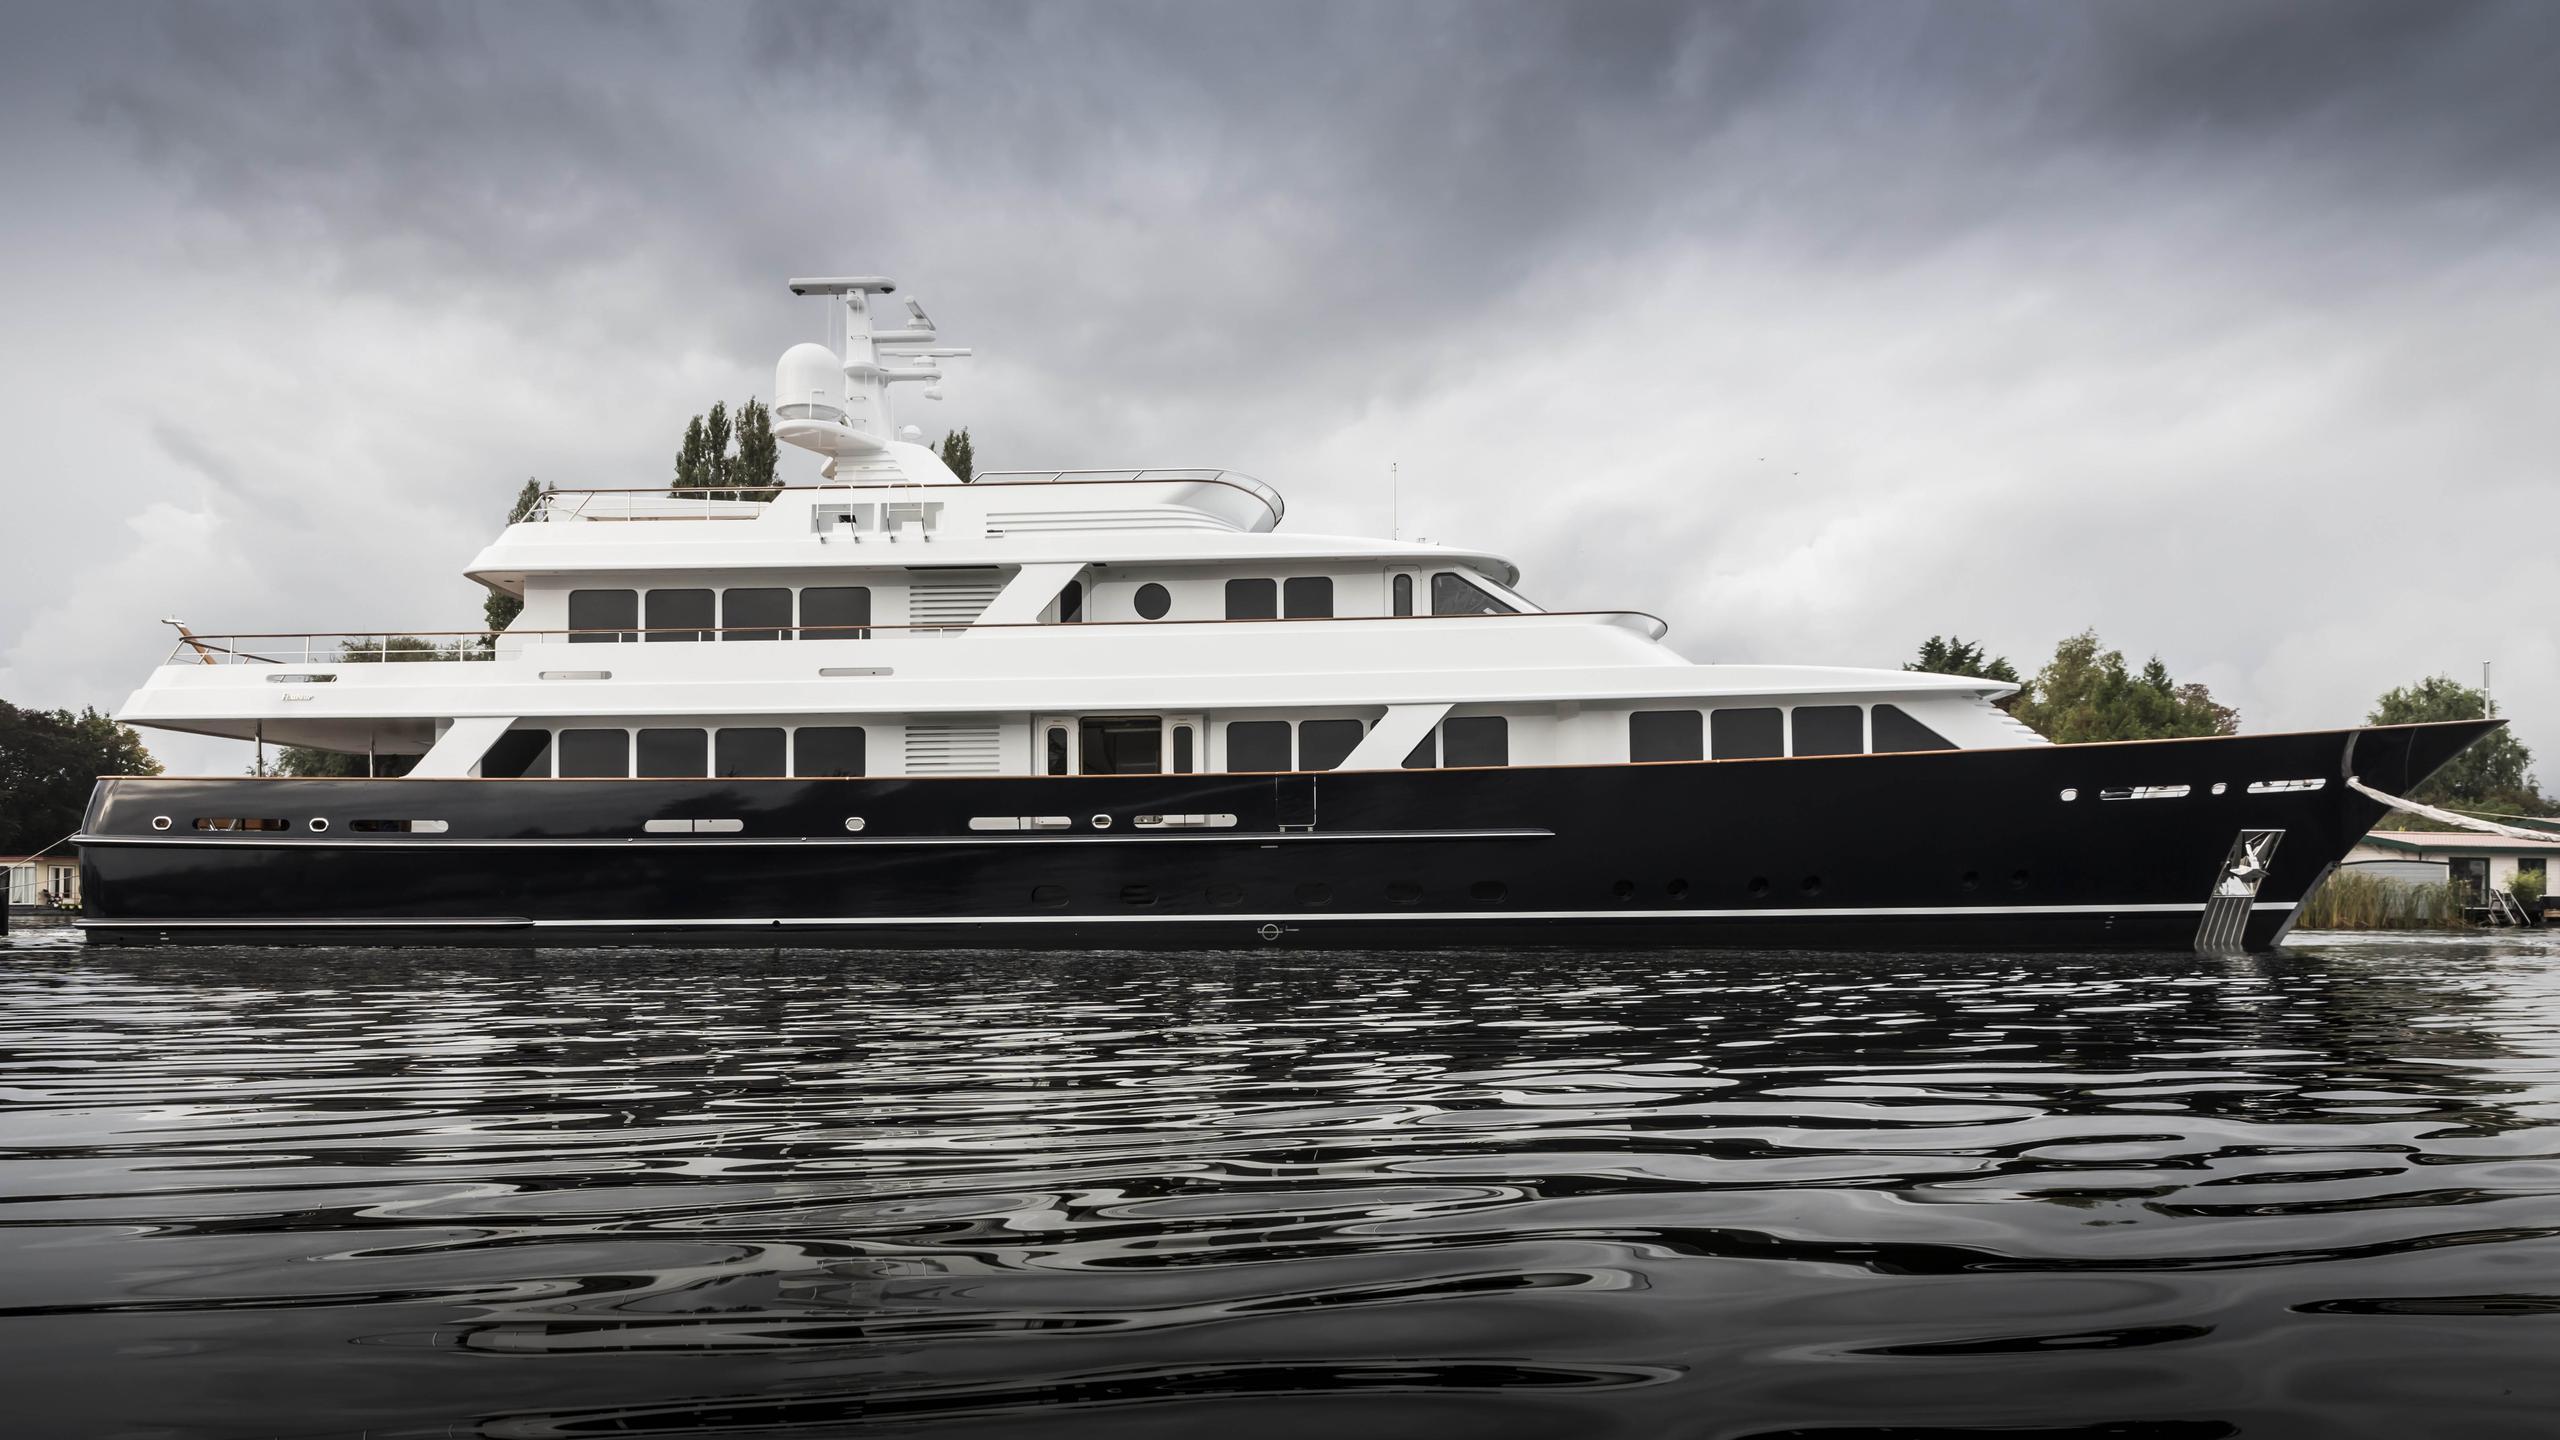 valoria b femke hull 697 motoryacht feadship 47m 2017 launch profile